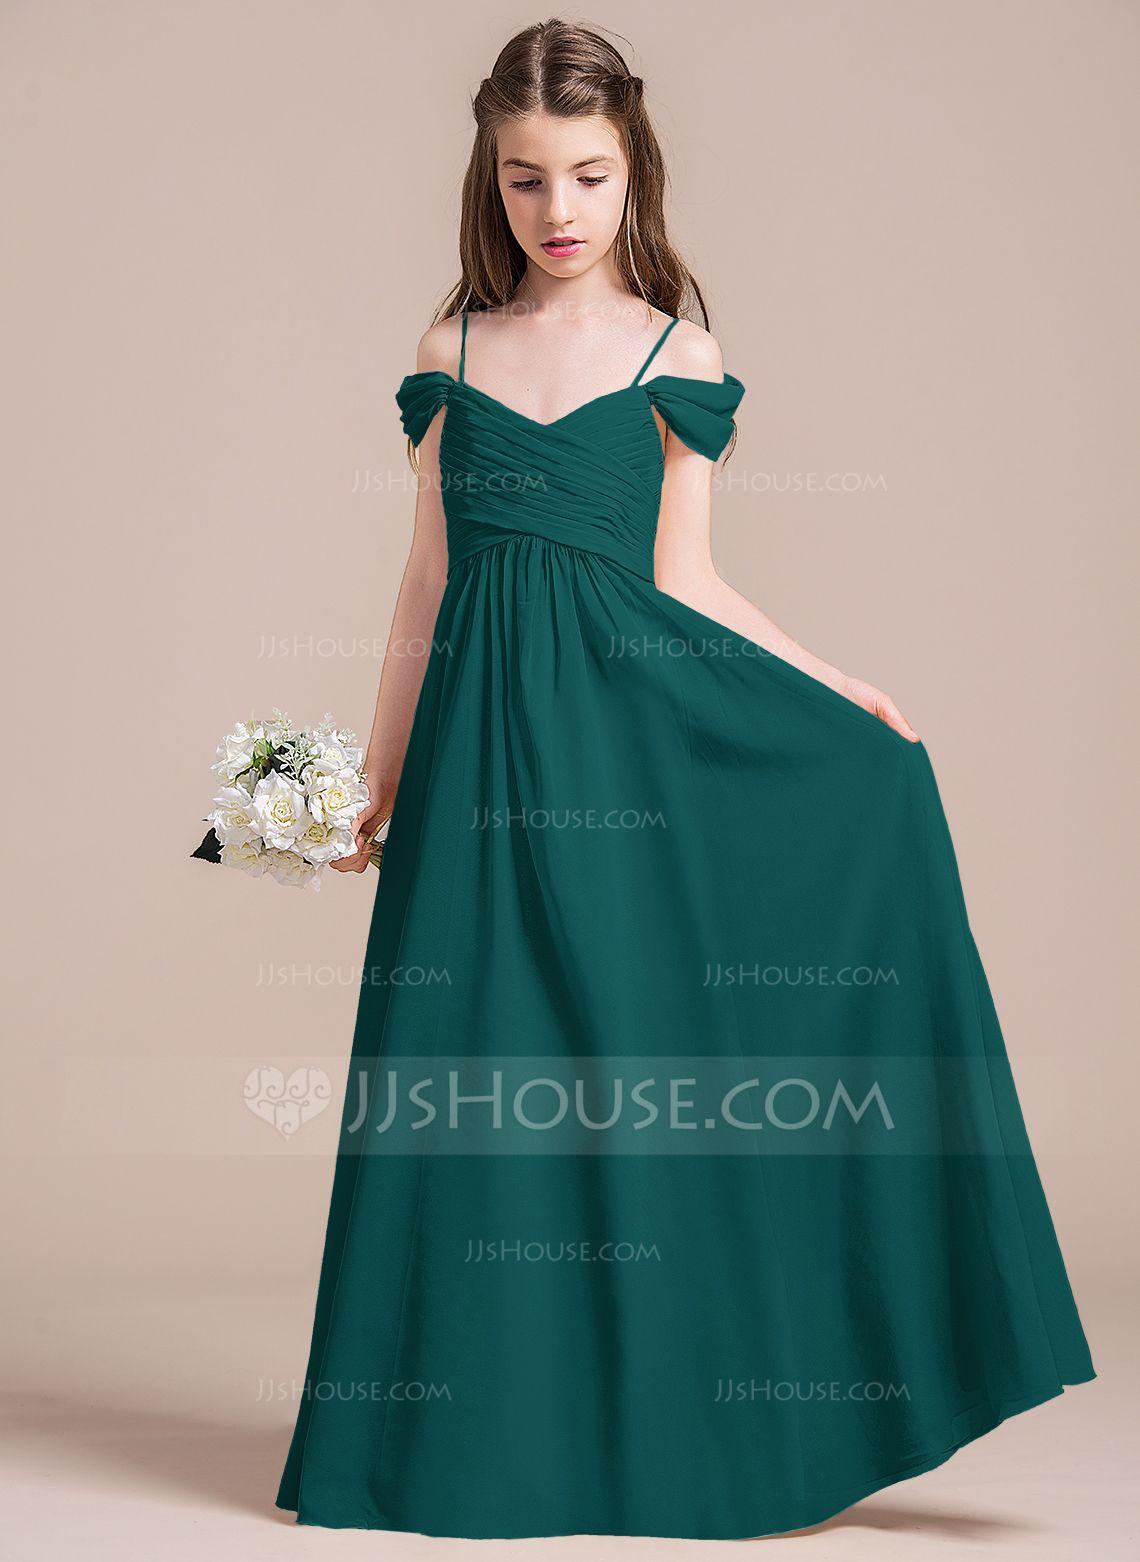 0130b343540 A-Line Princess Off-the-Shoulder Floor-Length Chiffon Junior Bridesmaid  Dress With Ruffle (009087895) - Junior Bridesmaid Dresses - JJsHouse